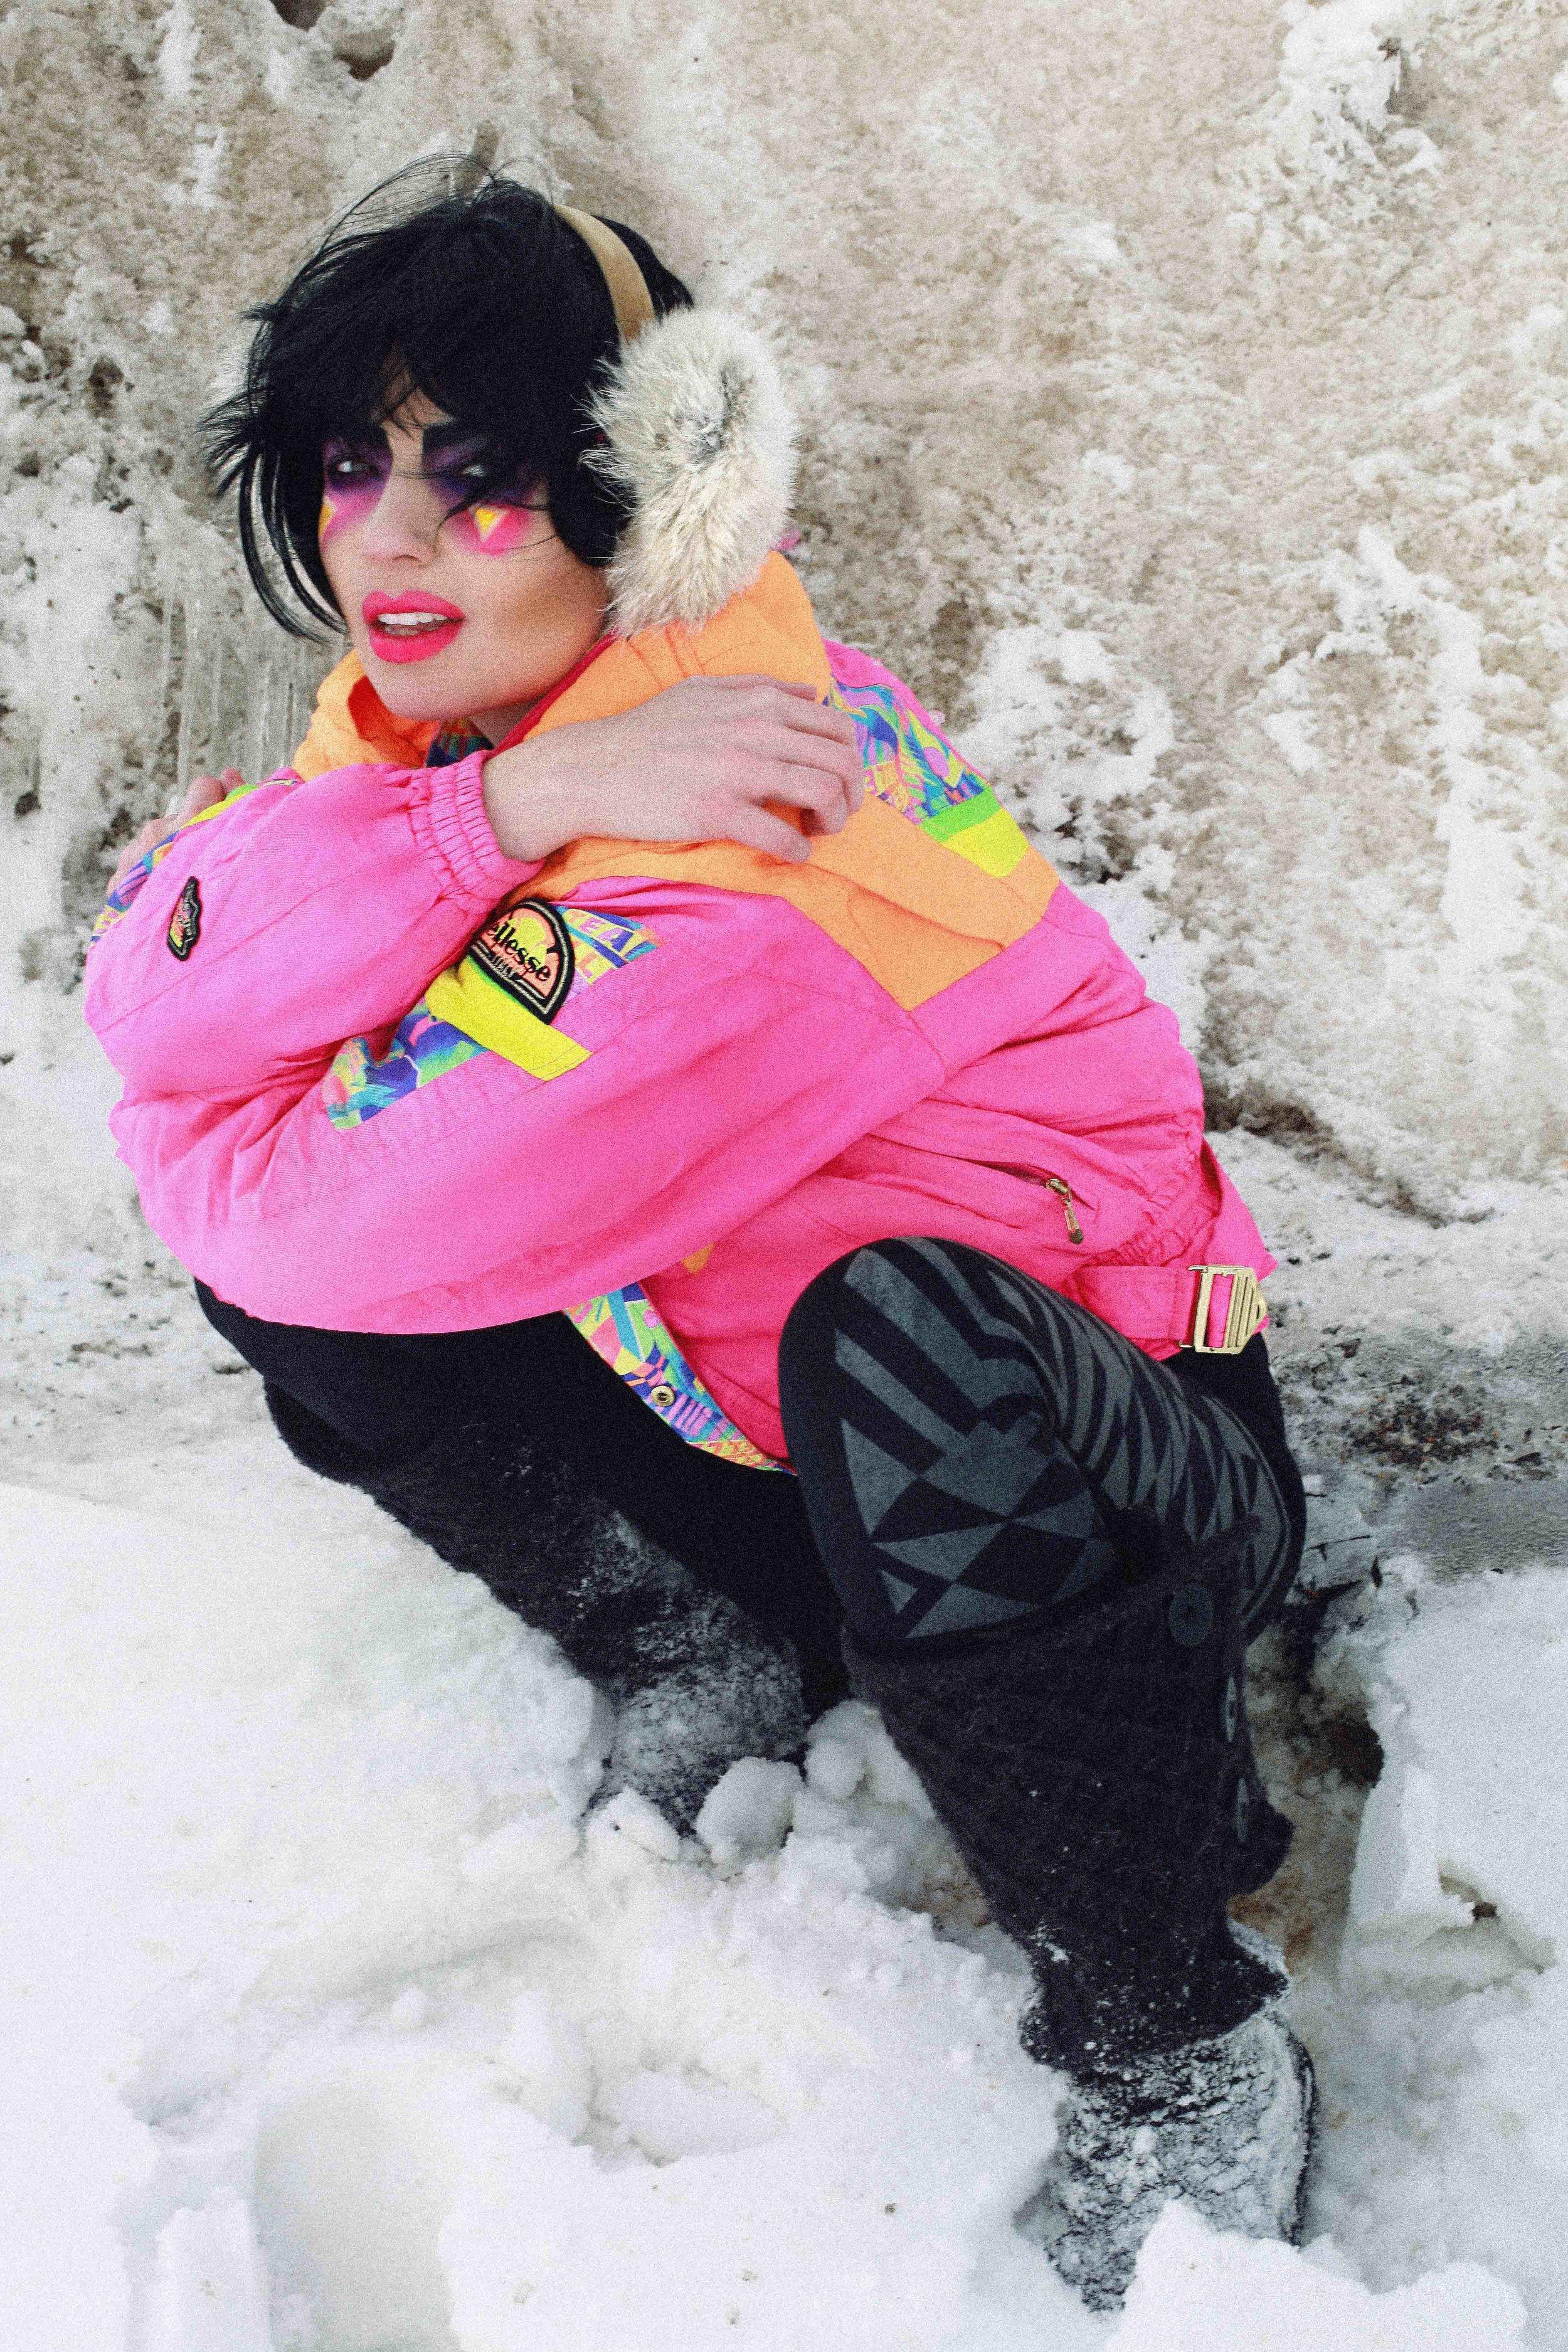 80'S SNOW BUNNY- Retro Ski Photo Shoot Story shot by Alyssa Risley - IG @alyssarisley